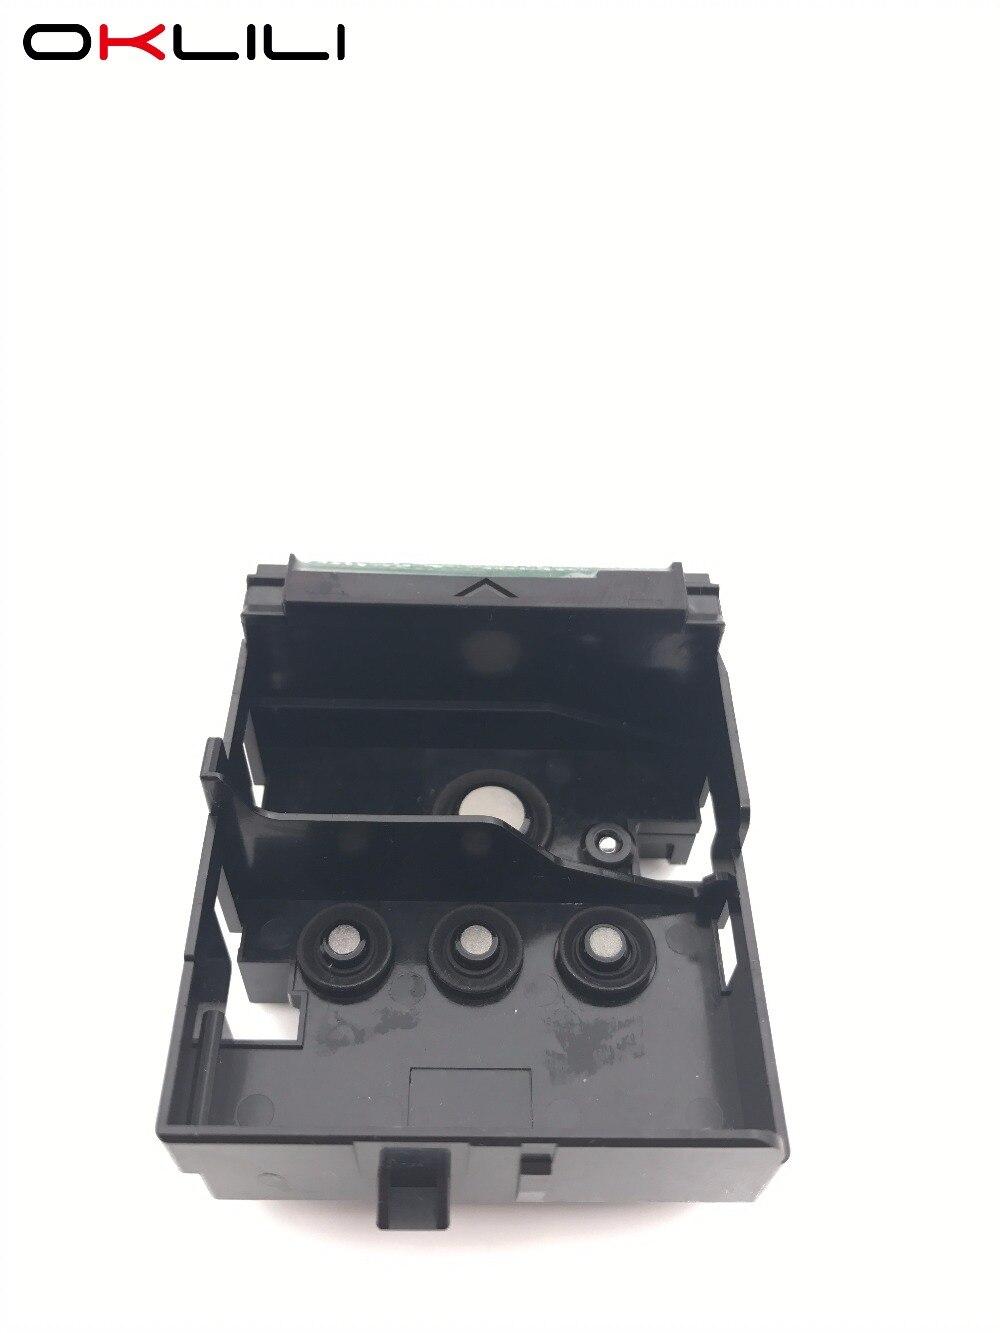 OKLILI ORIGINAL QY6-0052 QY6-0052-000 Printhead Print Head Printer Head for Canon PIXUS 80i i80 iP90 CF-PL90 PL95 PL90W PL95W<br>